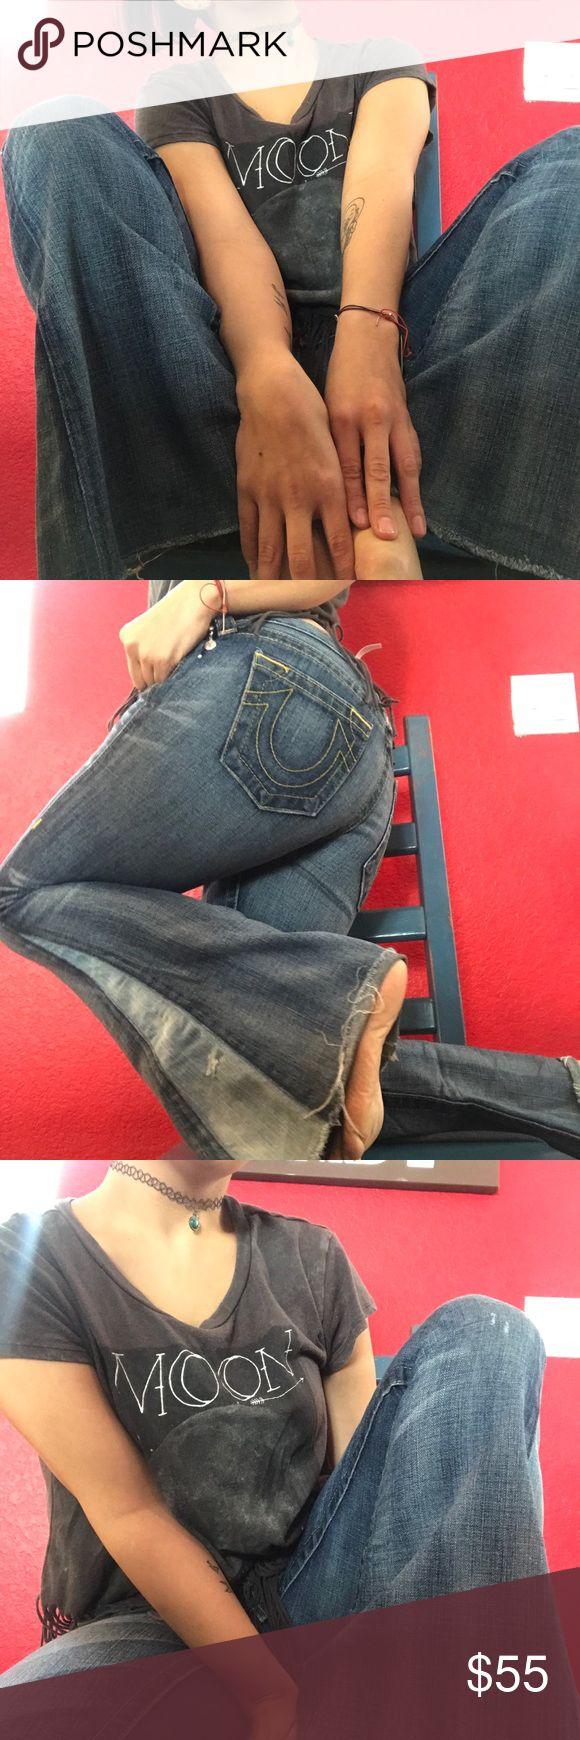 True Religion Jeans original cute hippie style true religion jeans True Religion Jeans Ankle & Cropped